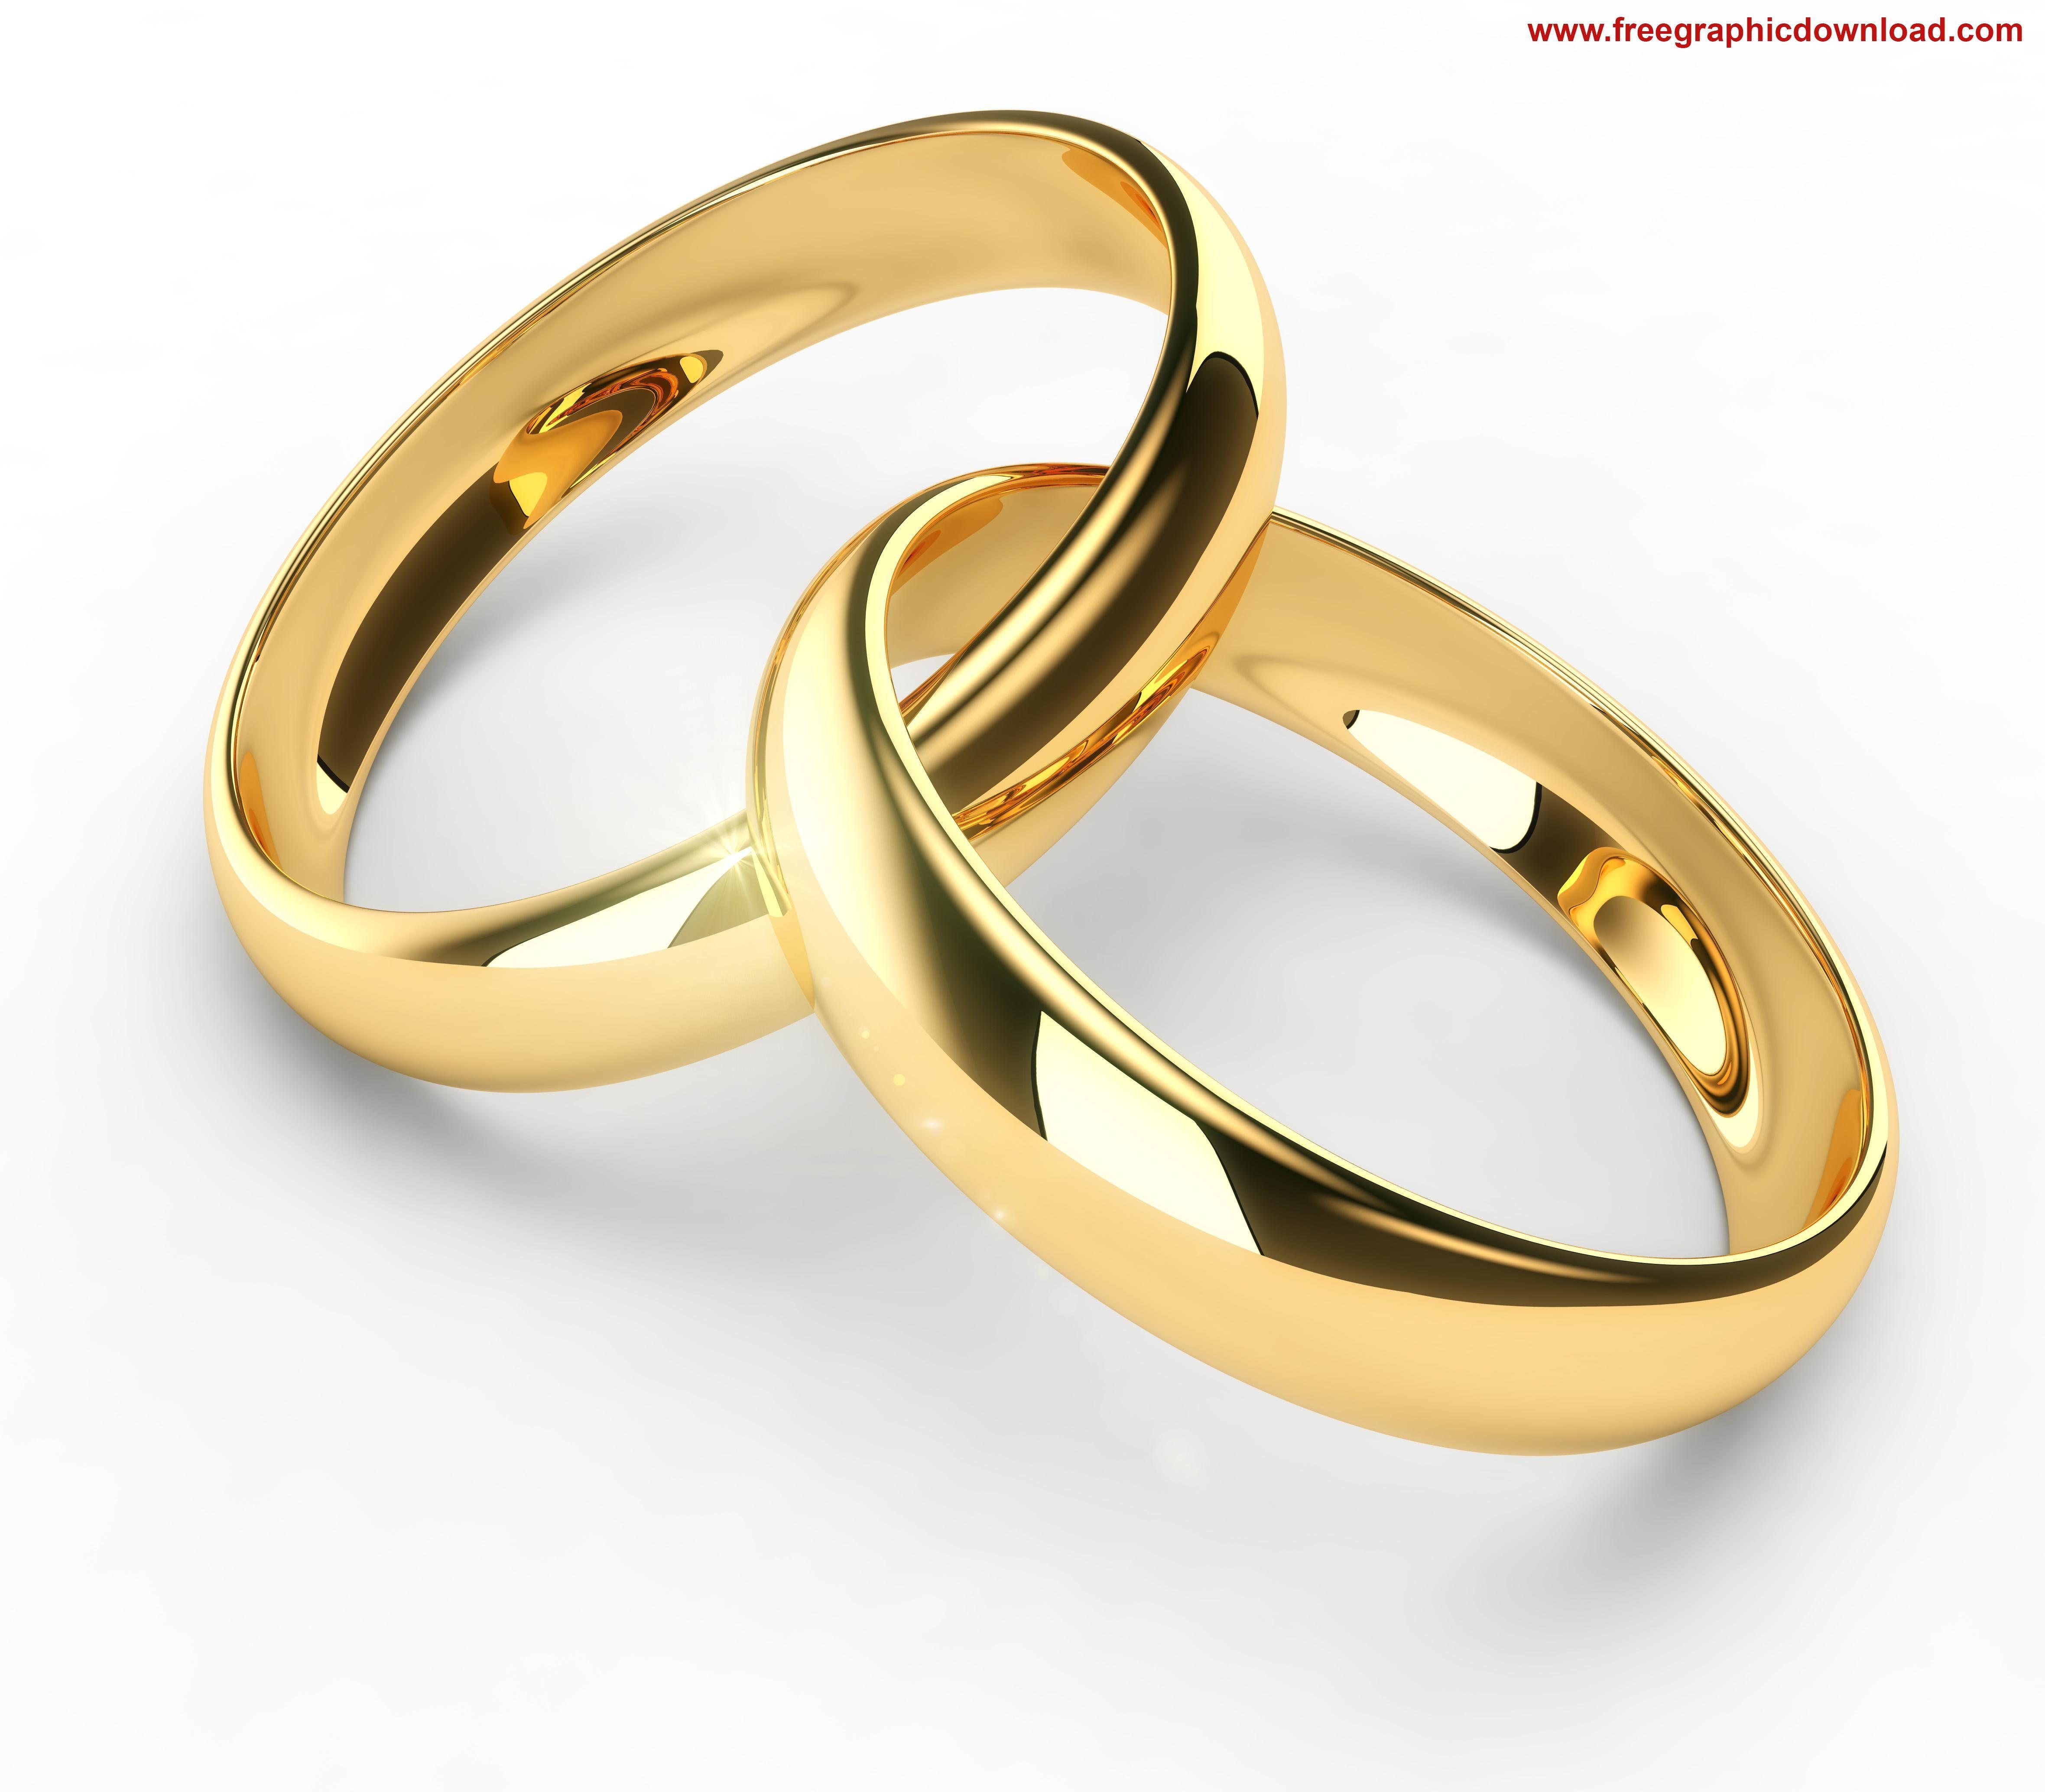 Engagement Ring Box Gif 4 Aliancas De Casamento Limpar Ouro Fotos De Anel De Casamento